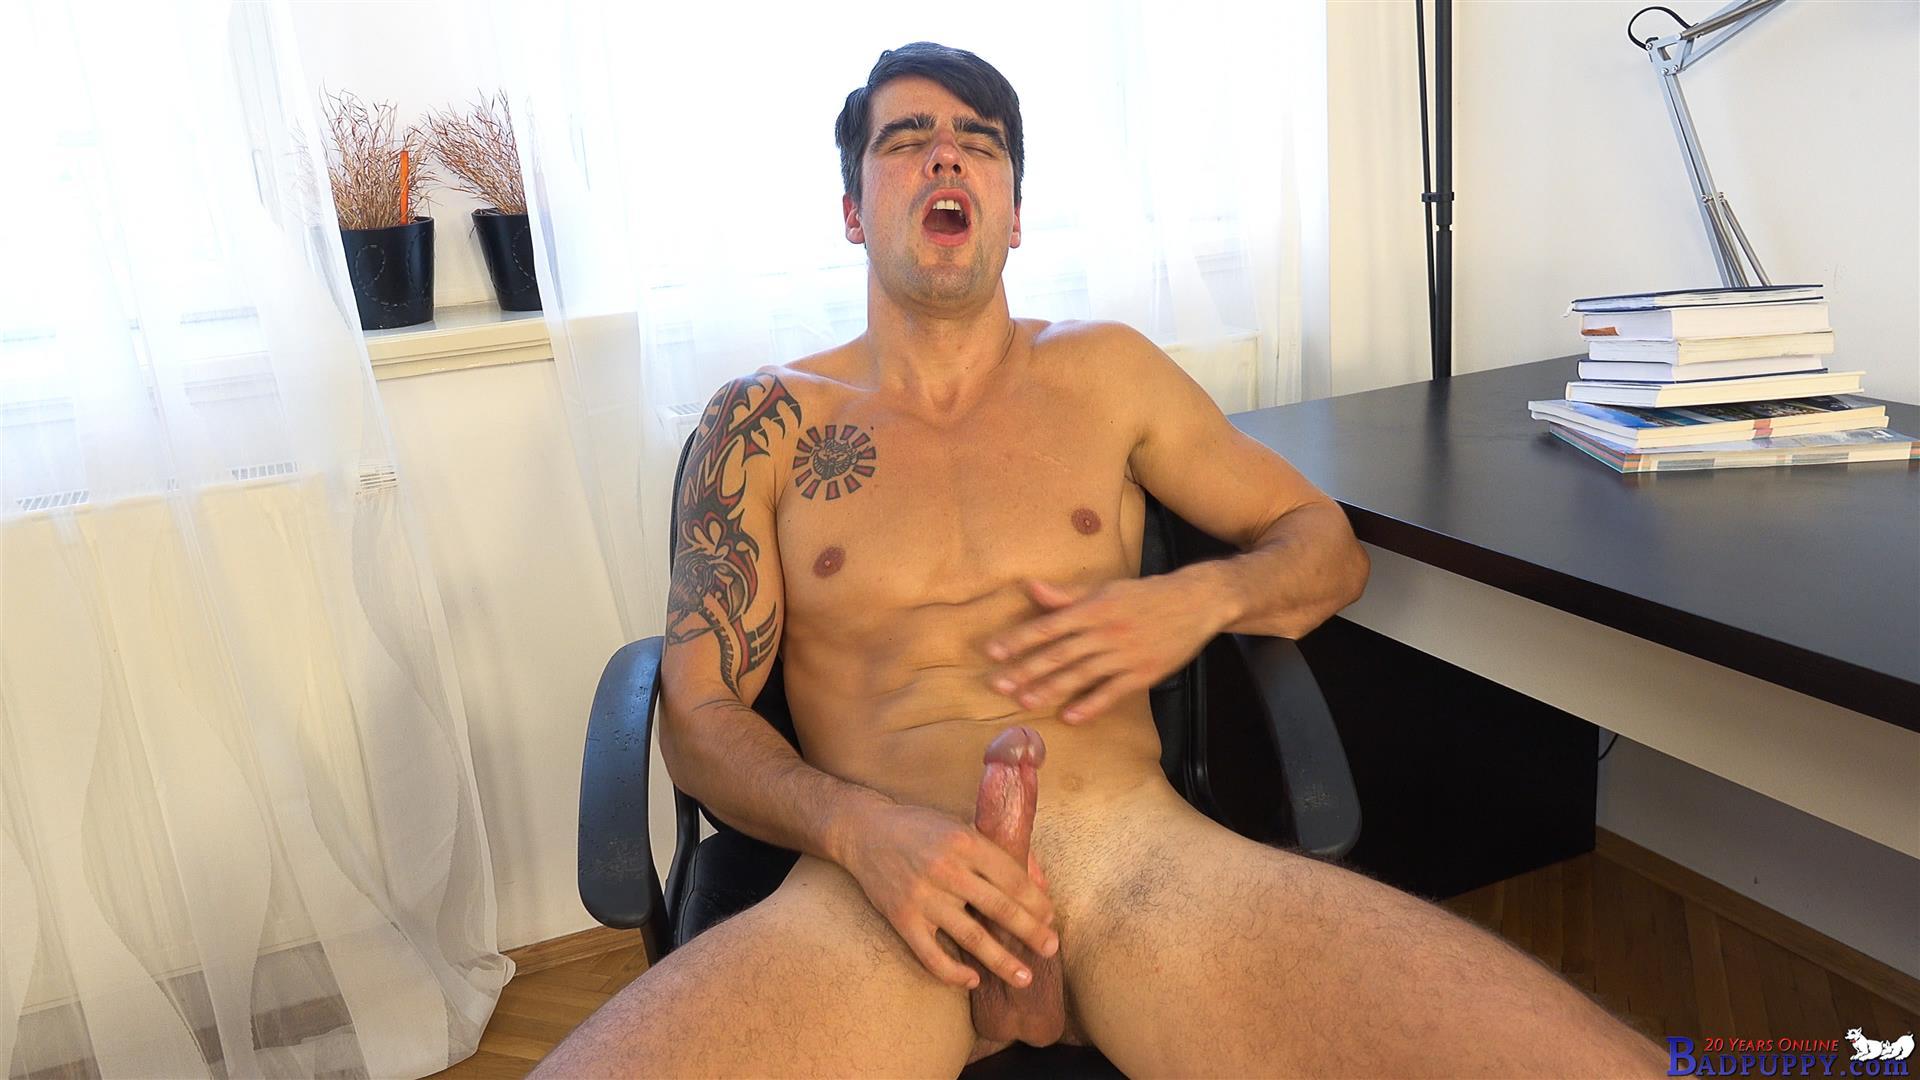 Badpuppy Milan Pis Straight Guy With Big Uncut Cock Masturbating Amateur Gay Porn 15